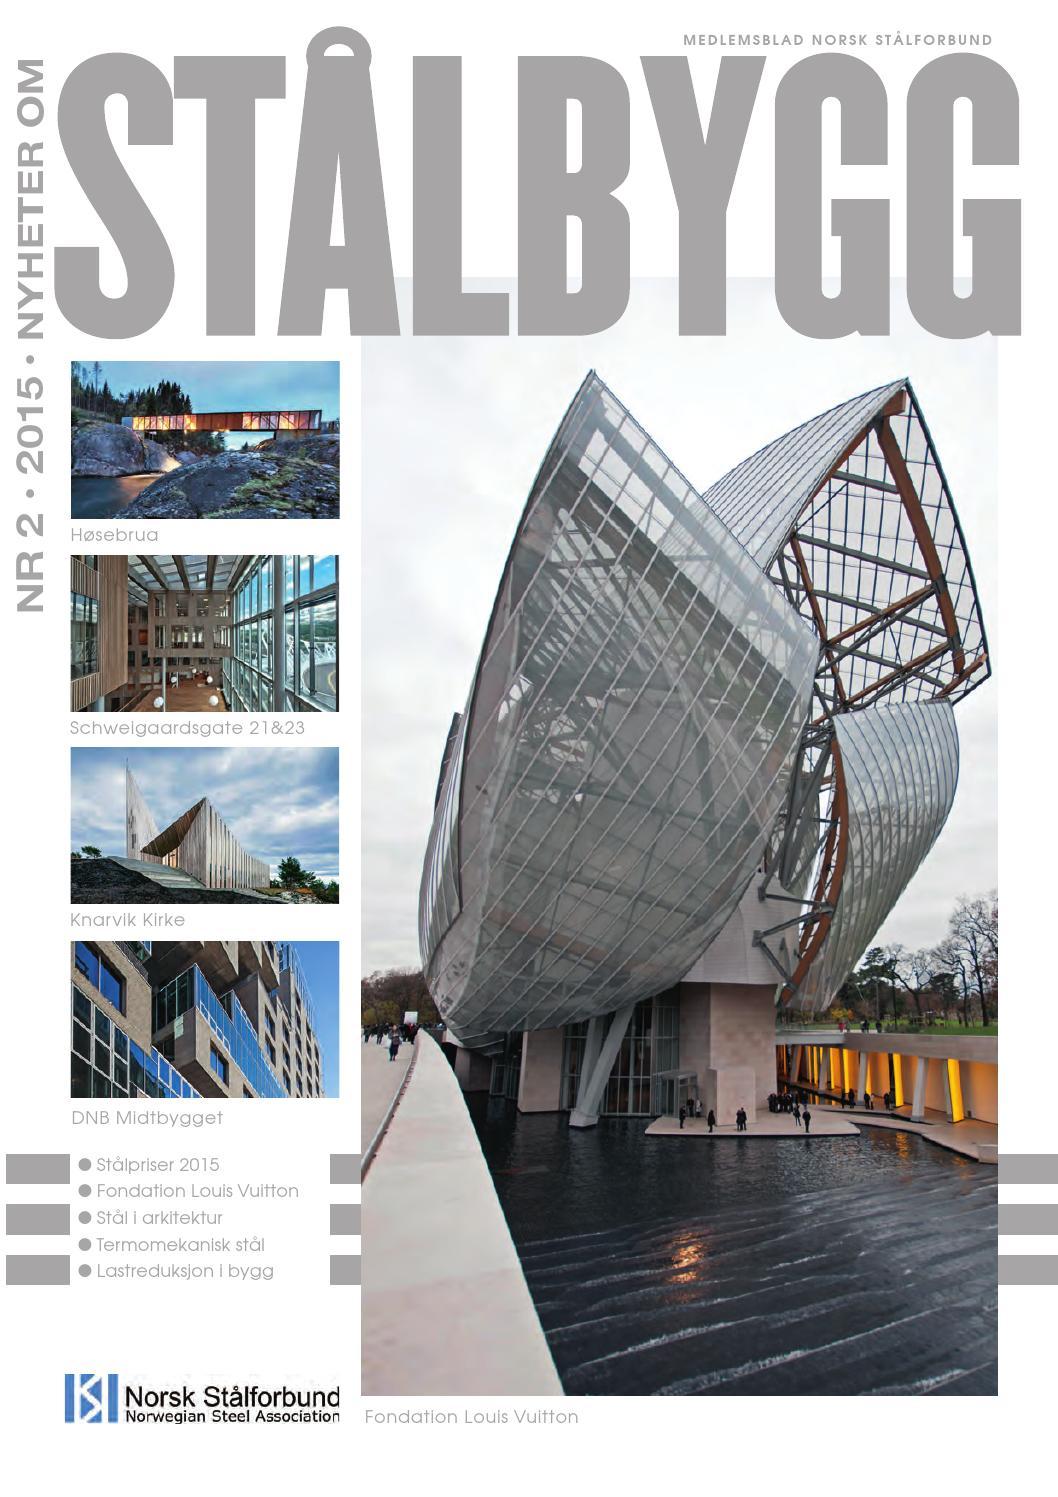 Staalbygg 2 2015 by nyheter om stÅlbygg   issuu